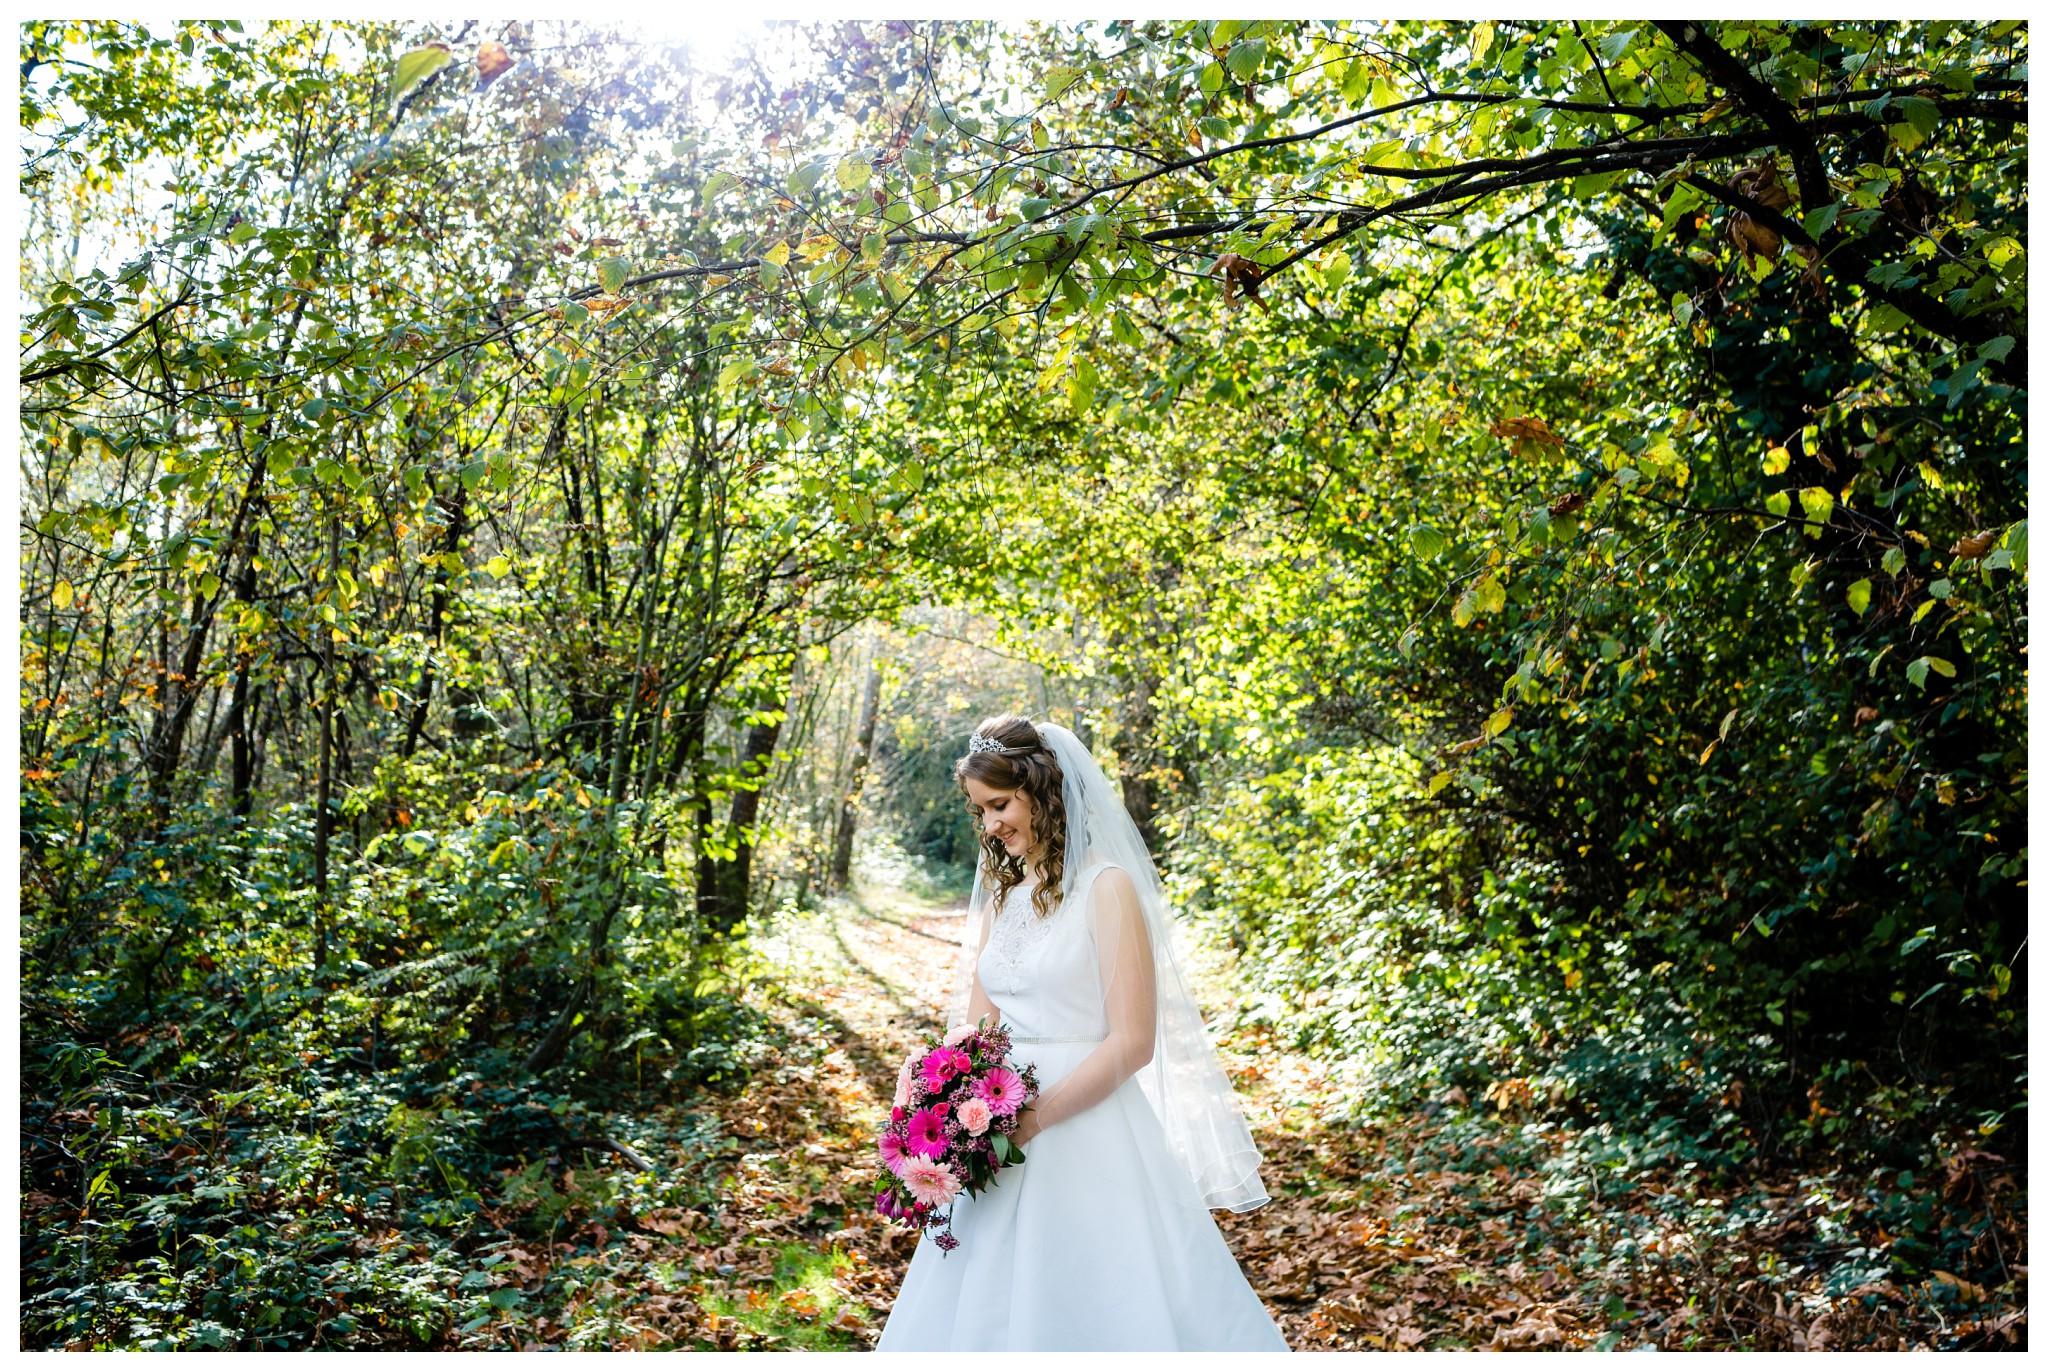 Aldergrove Park Christian Church Wedding Photography Pink Flowers Blue Bridesmaid Dress Fall_0097.jpg